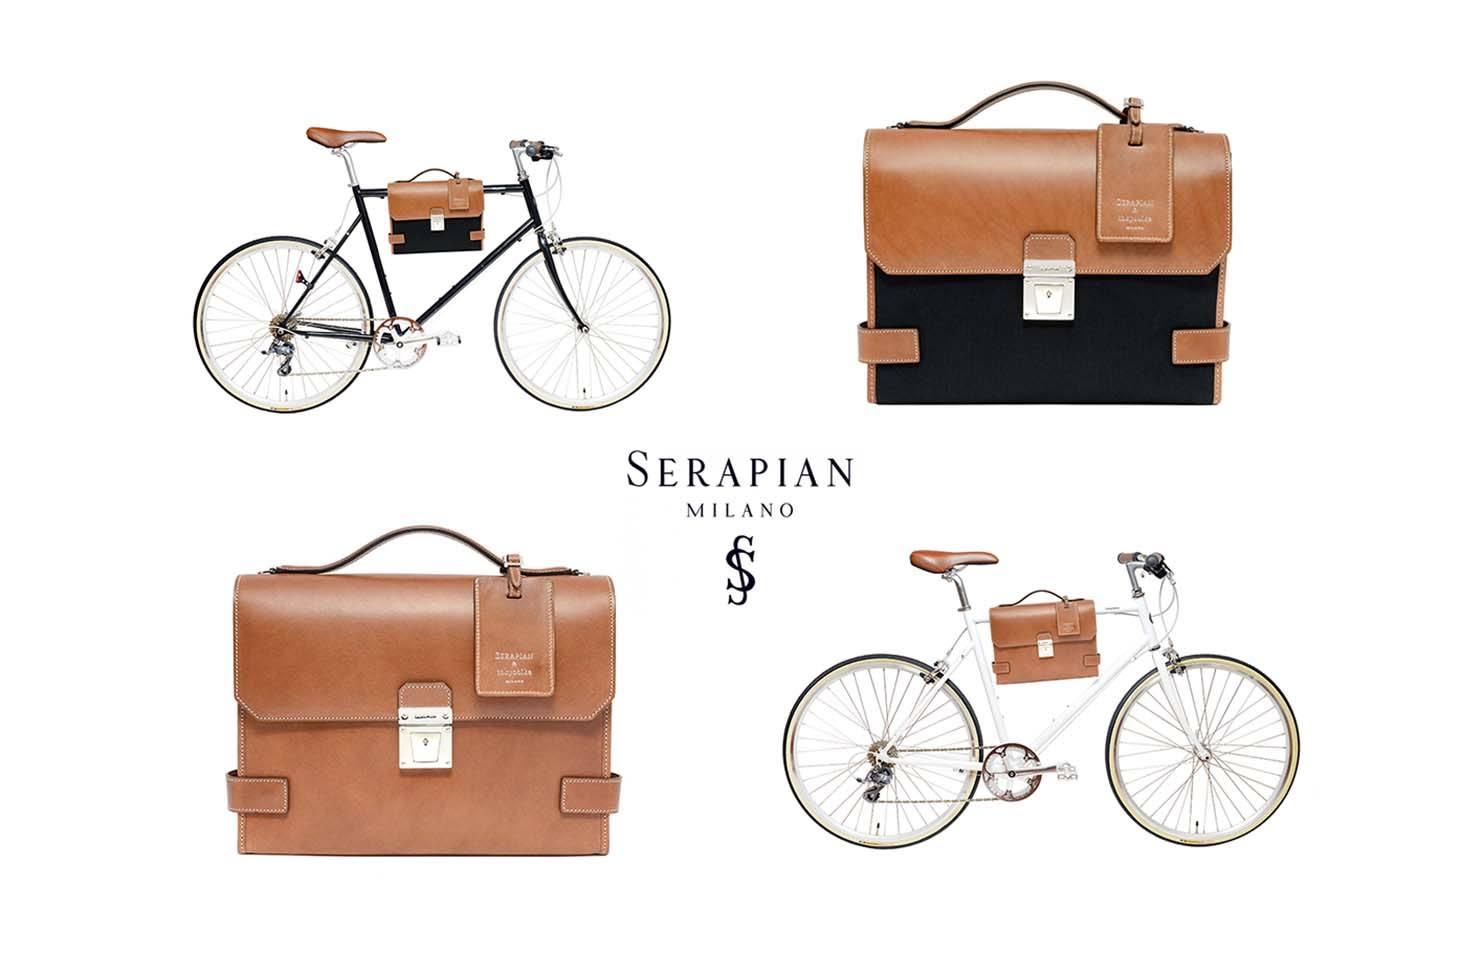 Serapian Milano - Tokyo Bags 2017